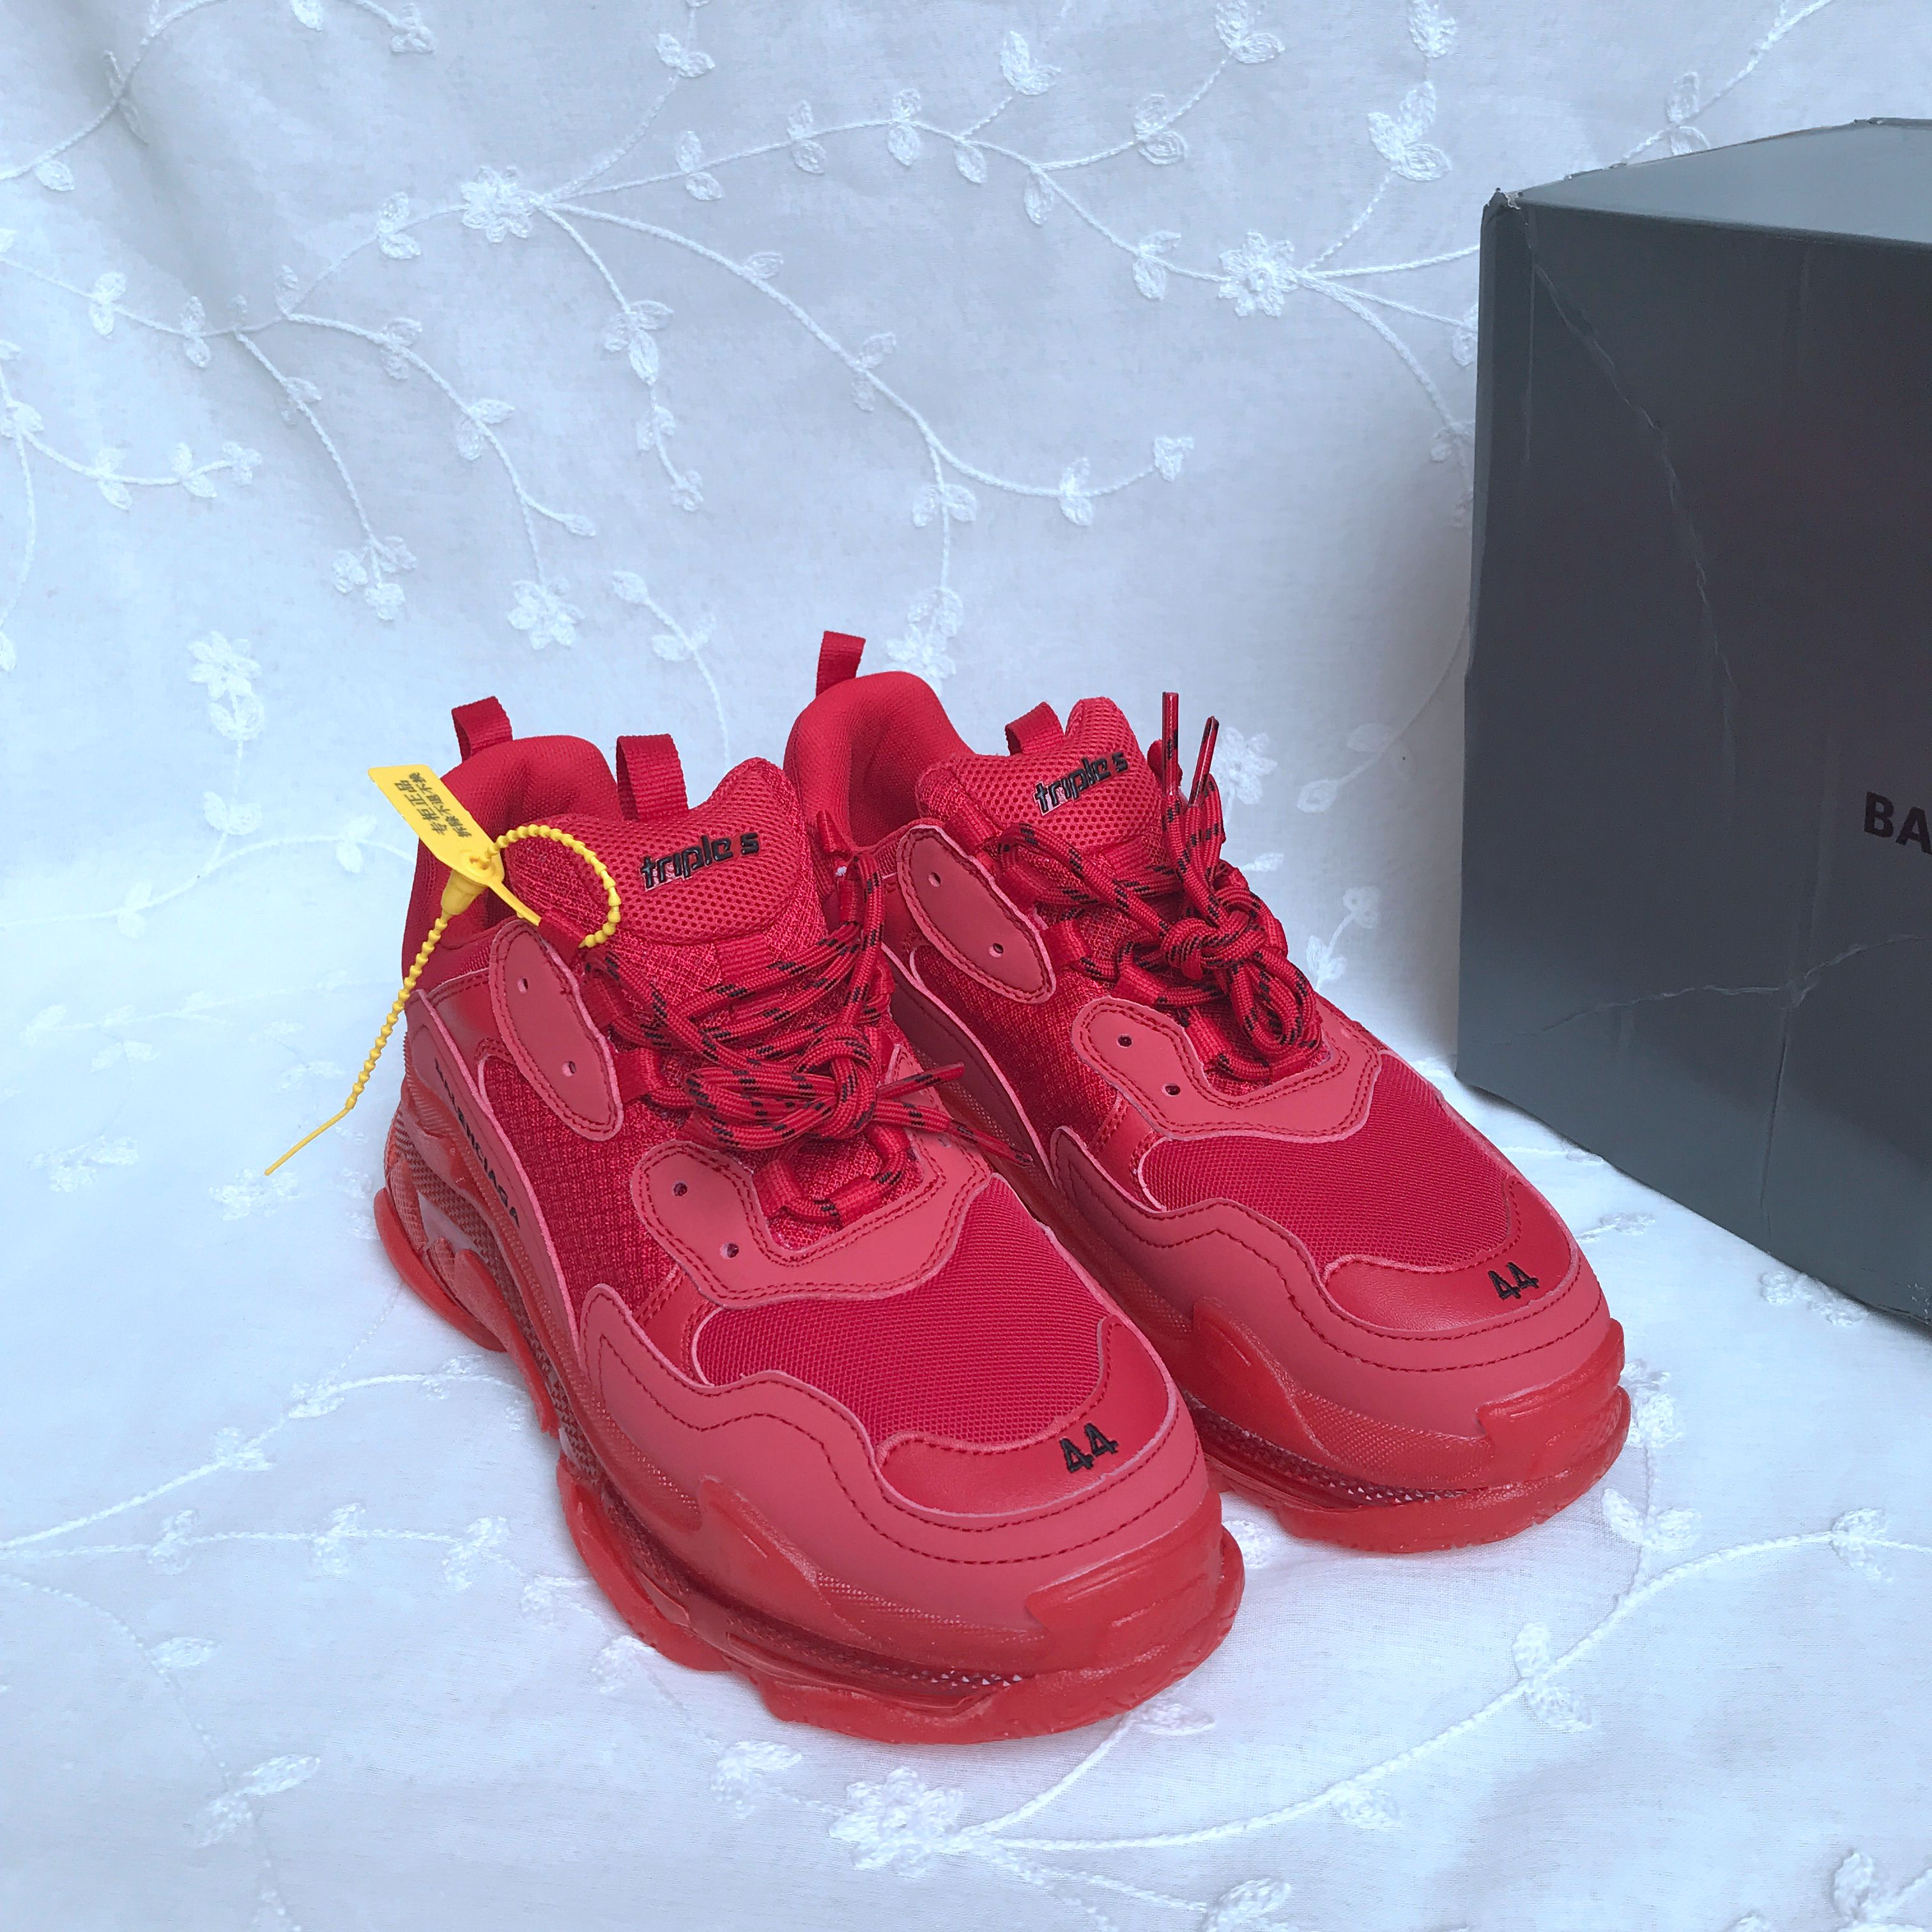 Balenciaga Triple S Mesh & Leather Sneakers  424411